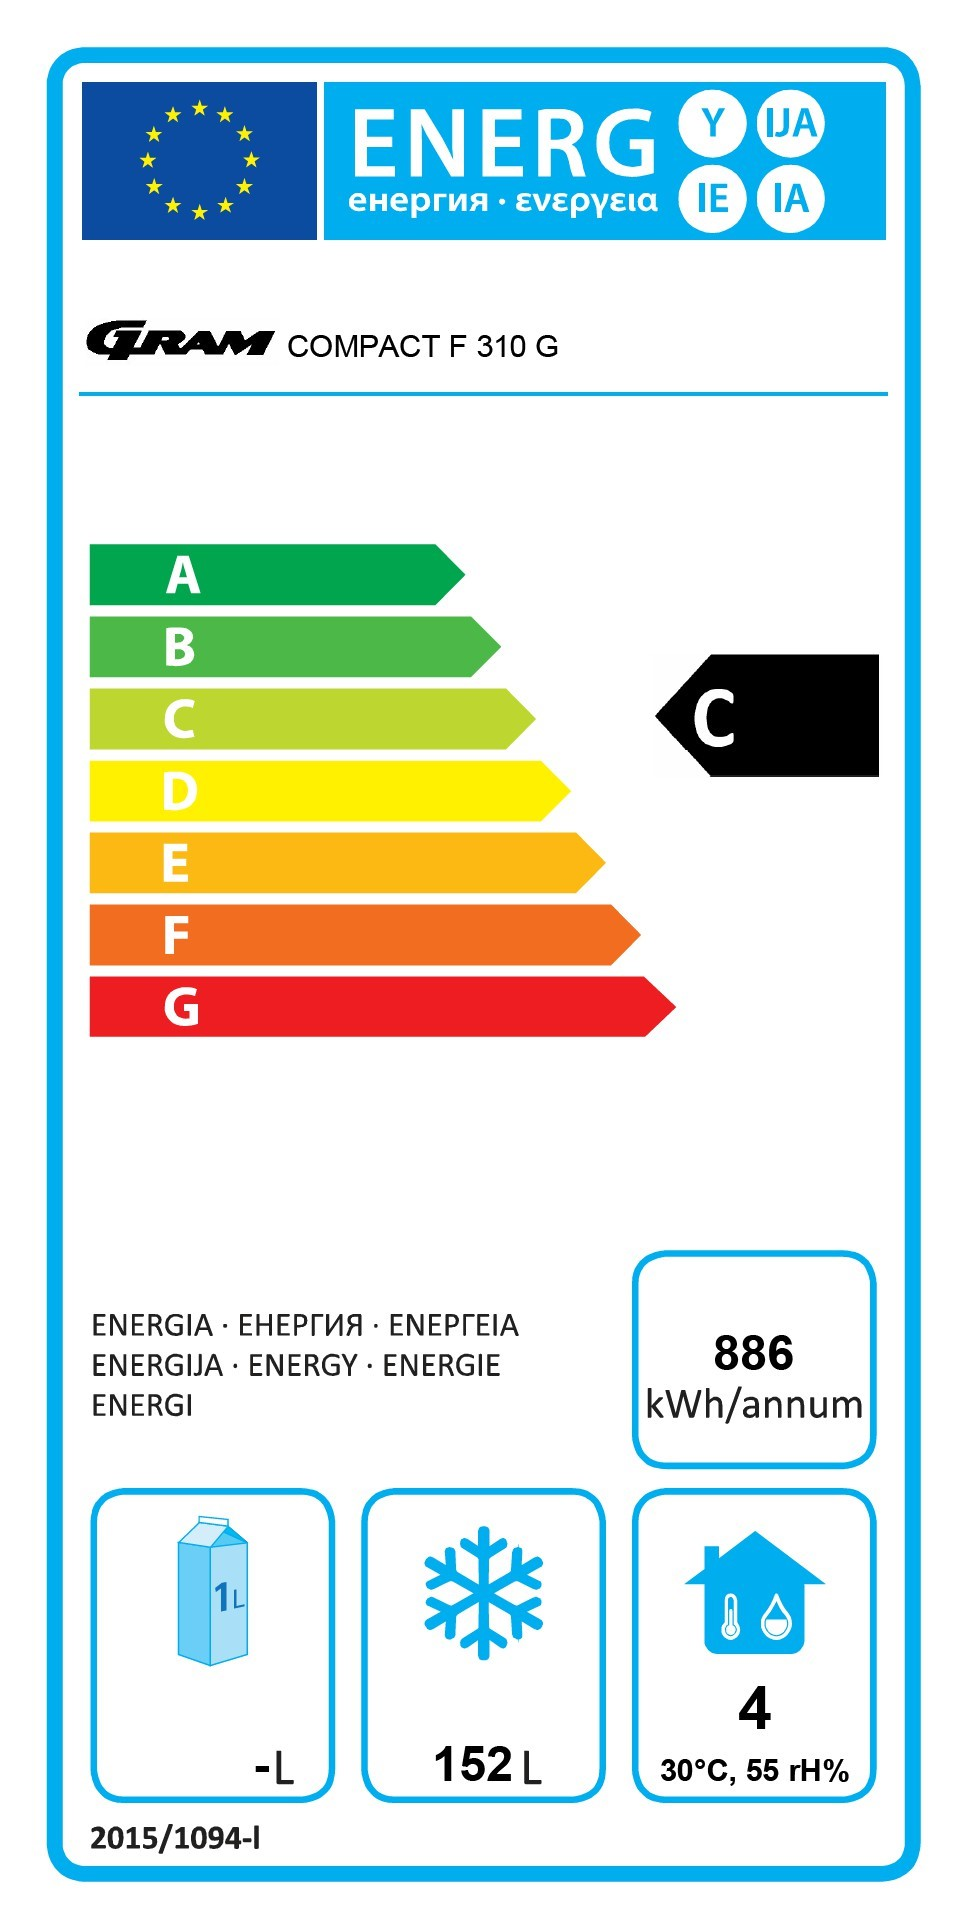 COMPACT F 310 LG C 4W 218 Ltr Upright Freezer Energy Rating